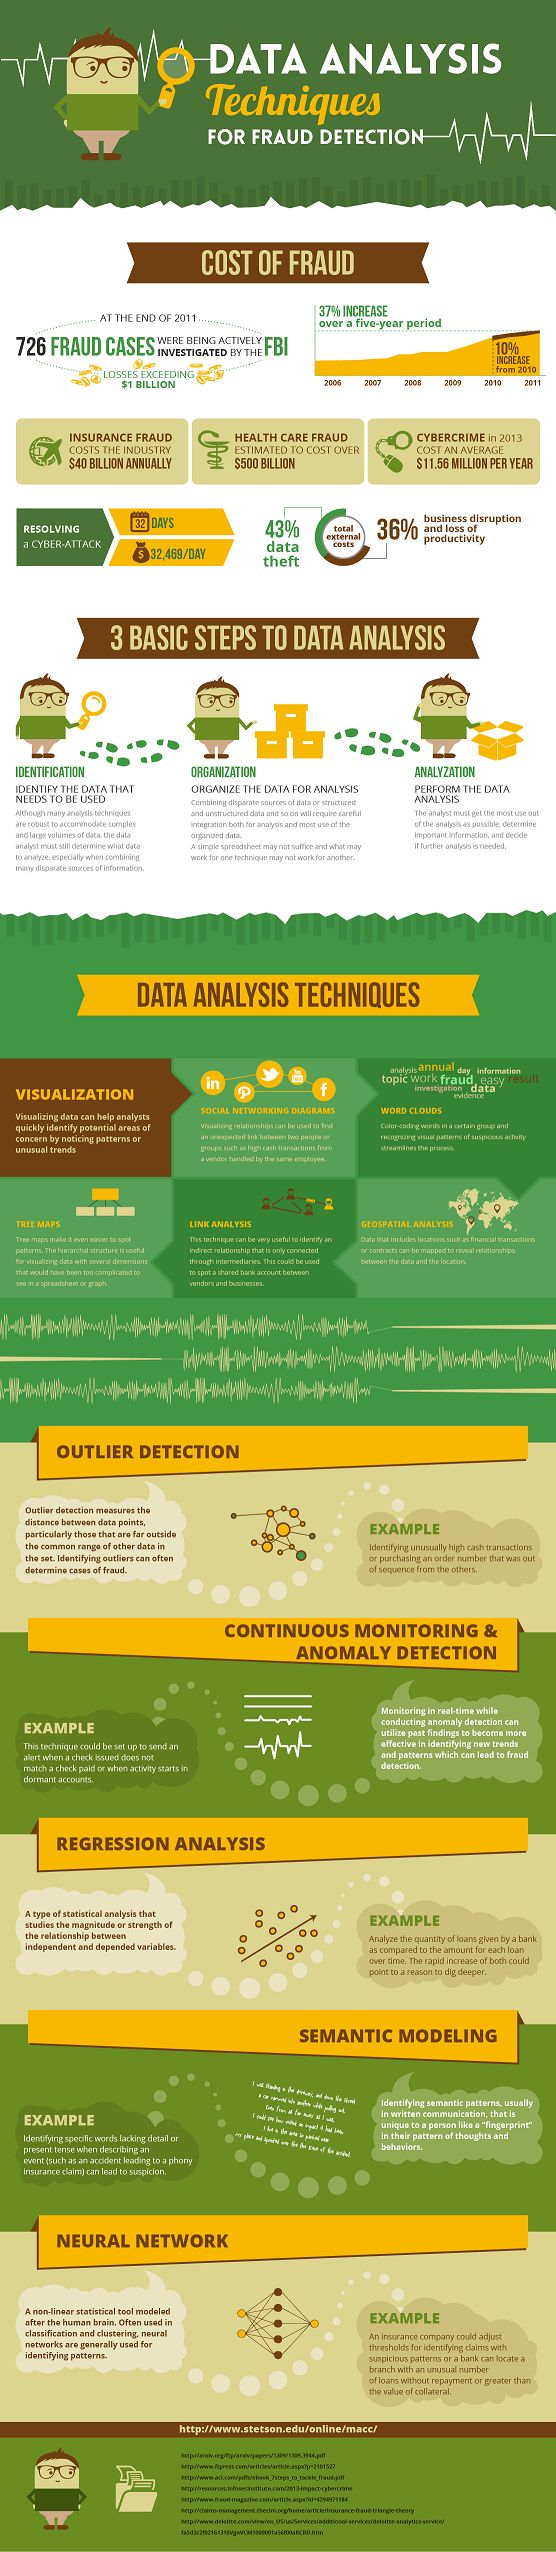 Detecting Fraud through Data Analysis